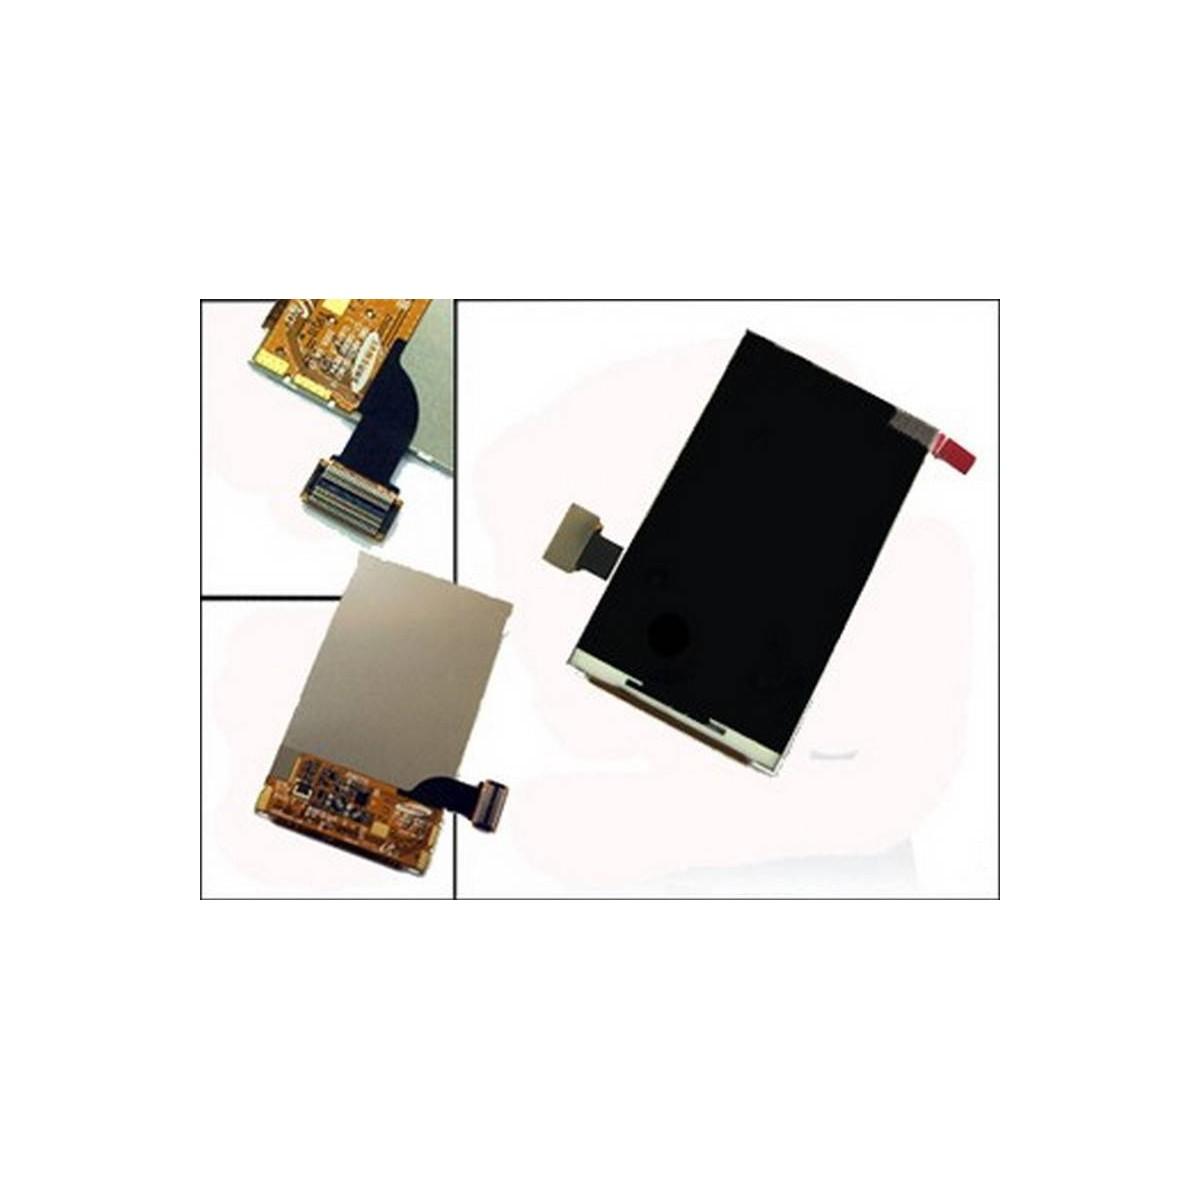 Samsung S8000 Jet Display, ecrã LCD